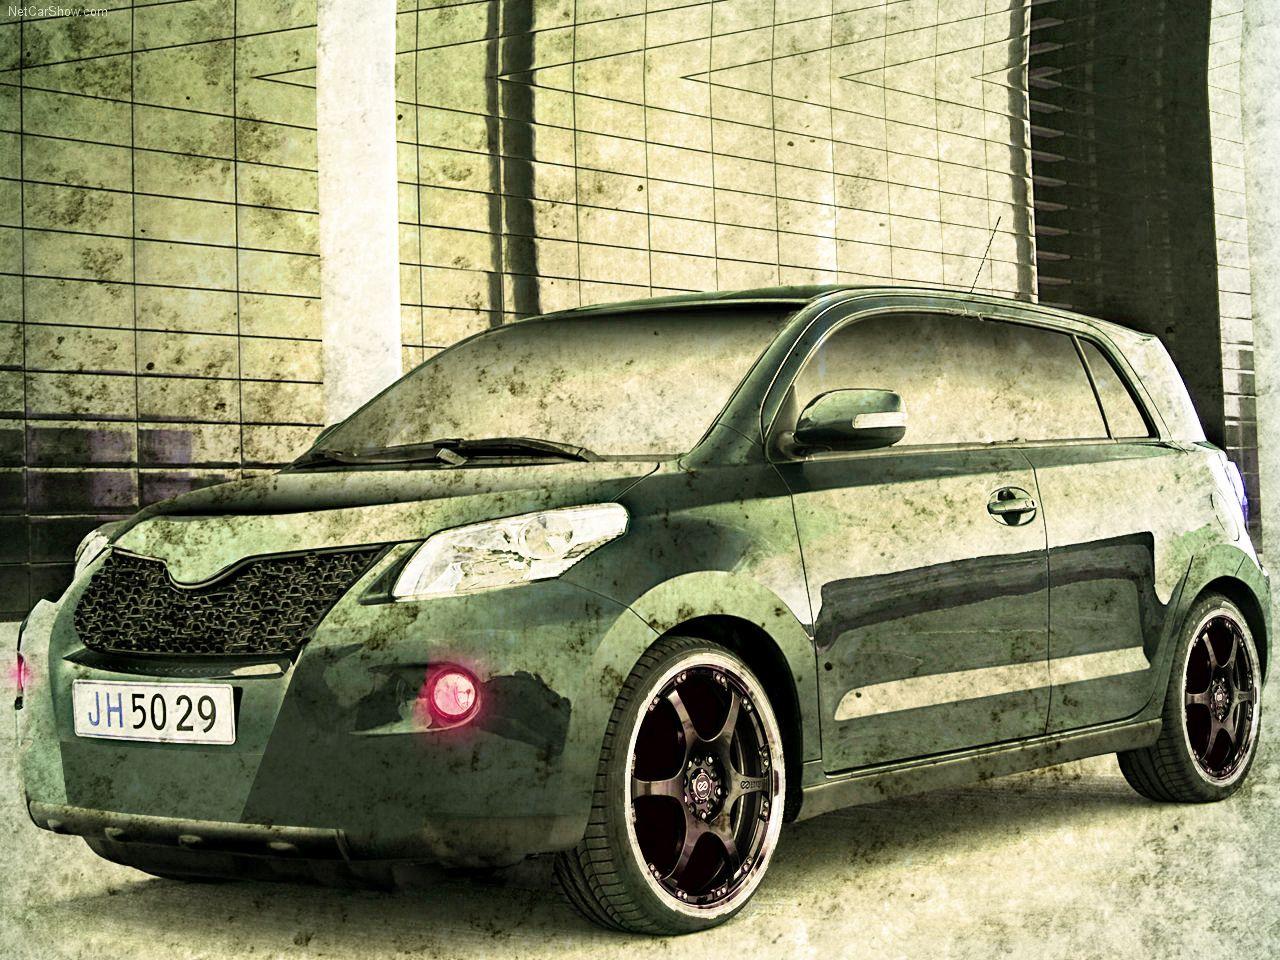 Toyota scion xd urban cruiser wallpaper by andalverz deviantart com on deviantart